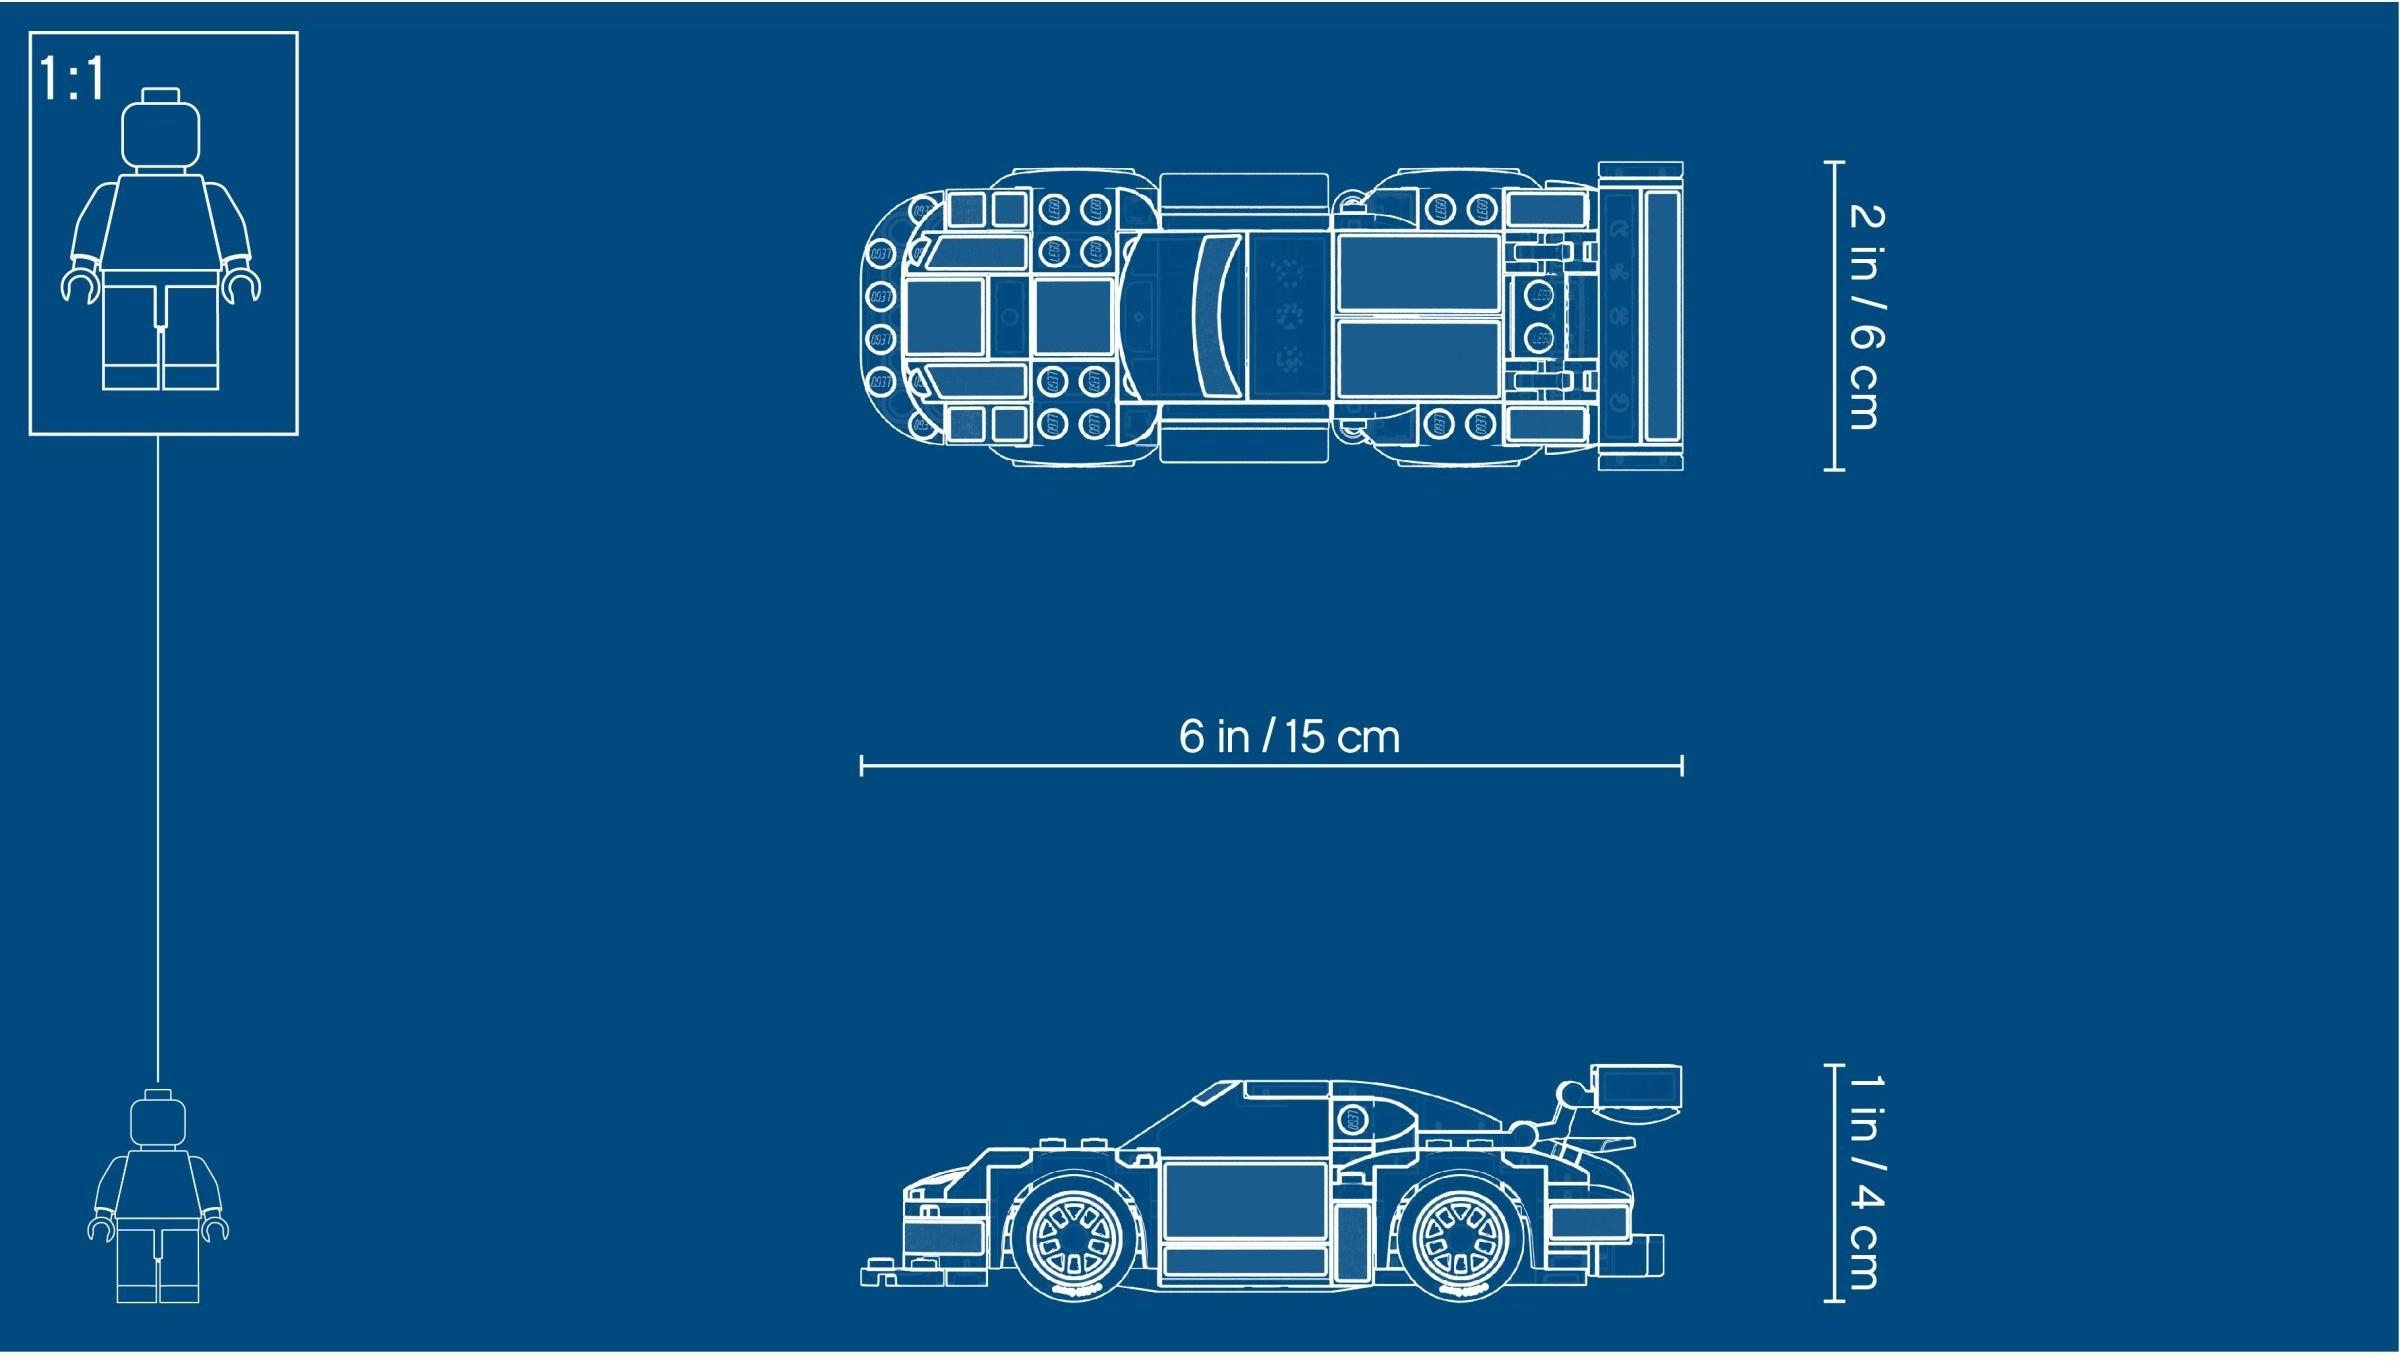 WANGE S72 Super Racing Cars: Porsche 911 RSR and Porsche 911 Turbo 3.0 1